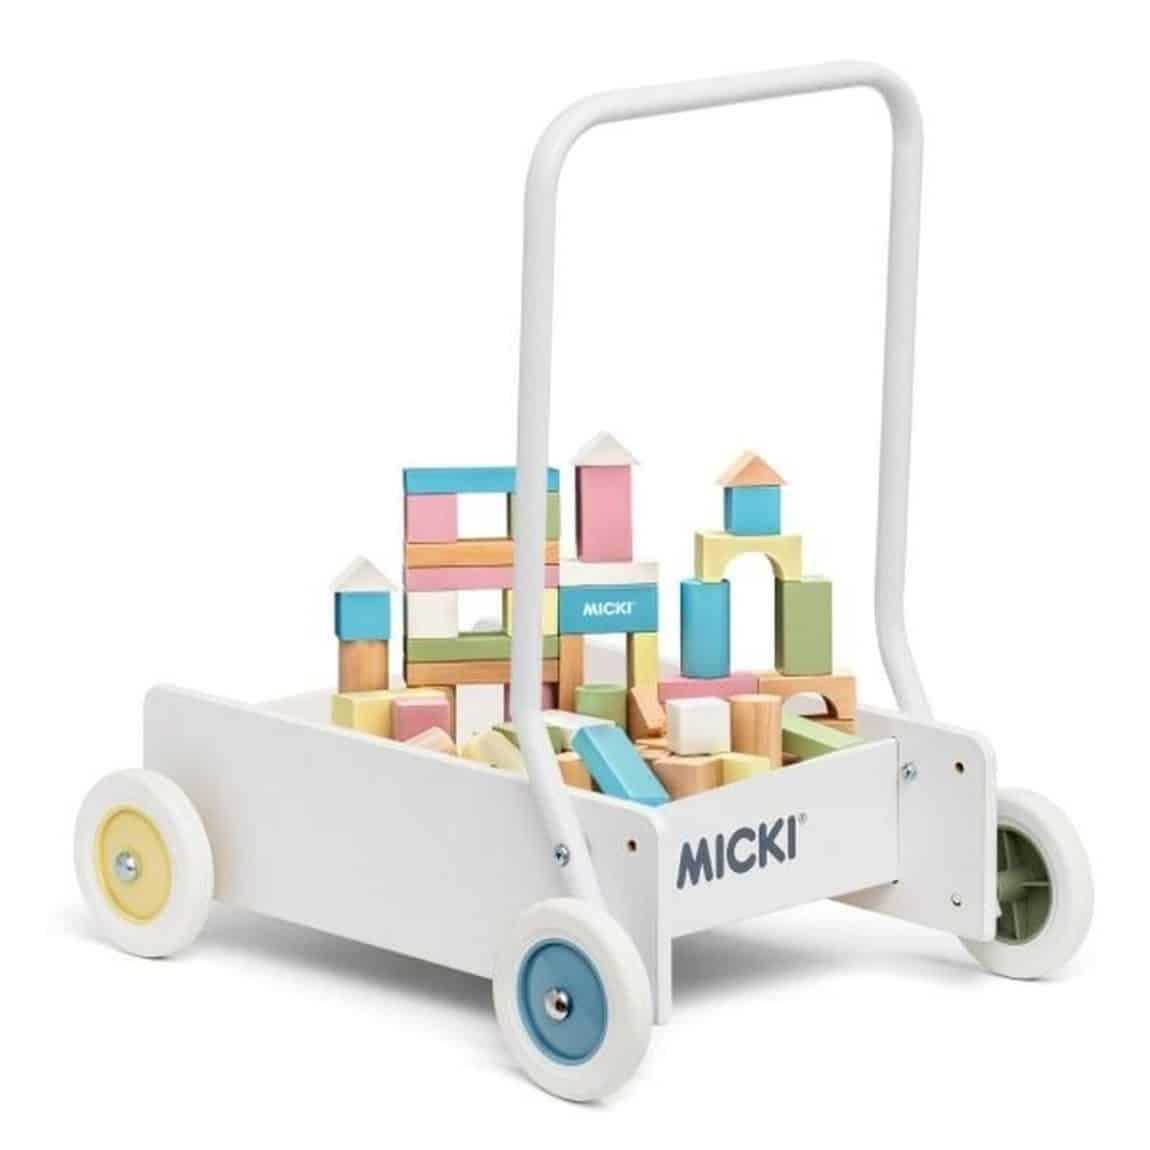 micki-vagn